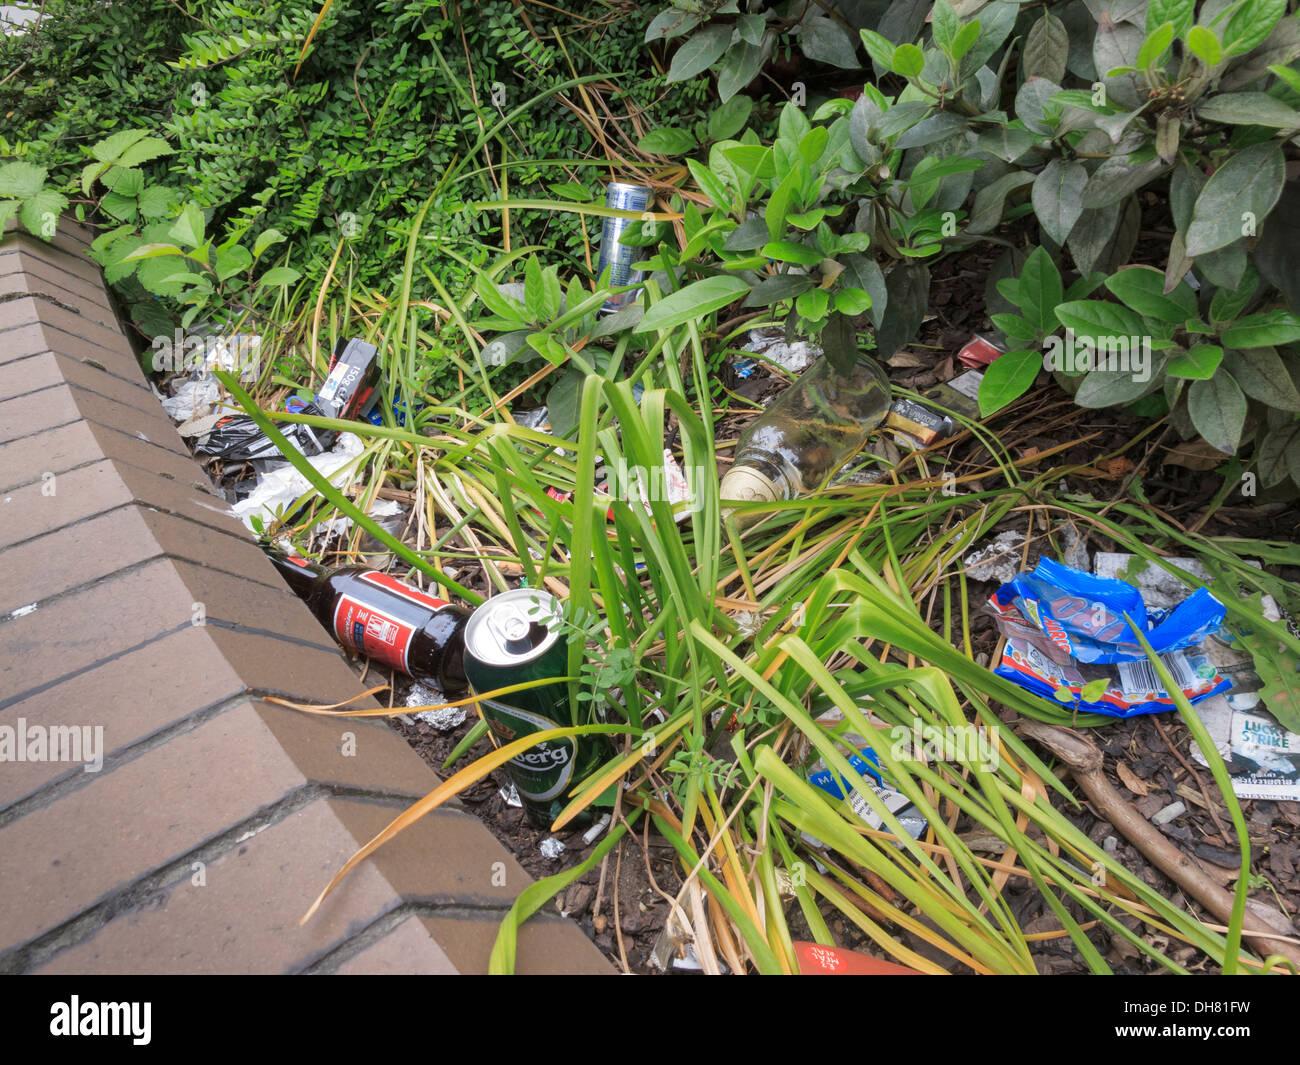 Rubbish Litter - Stock Image